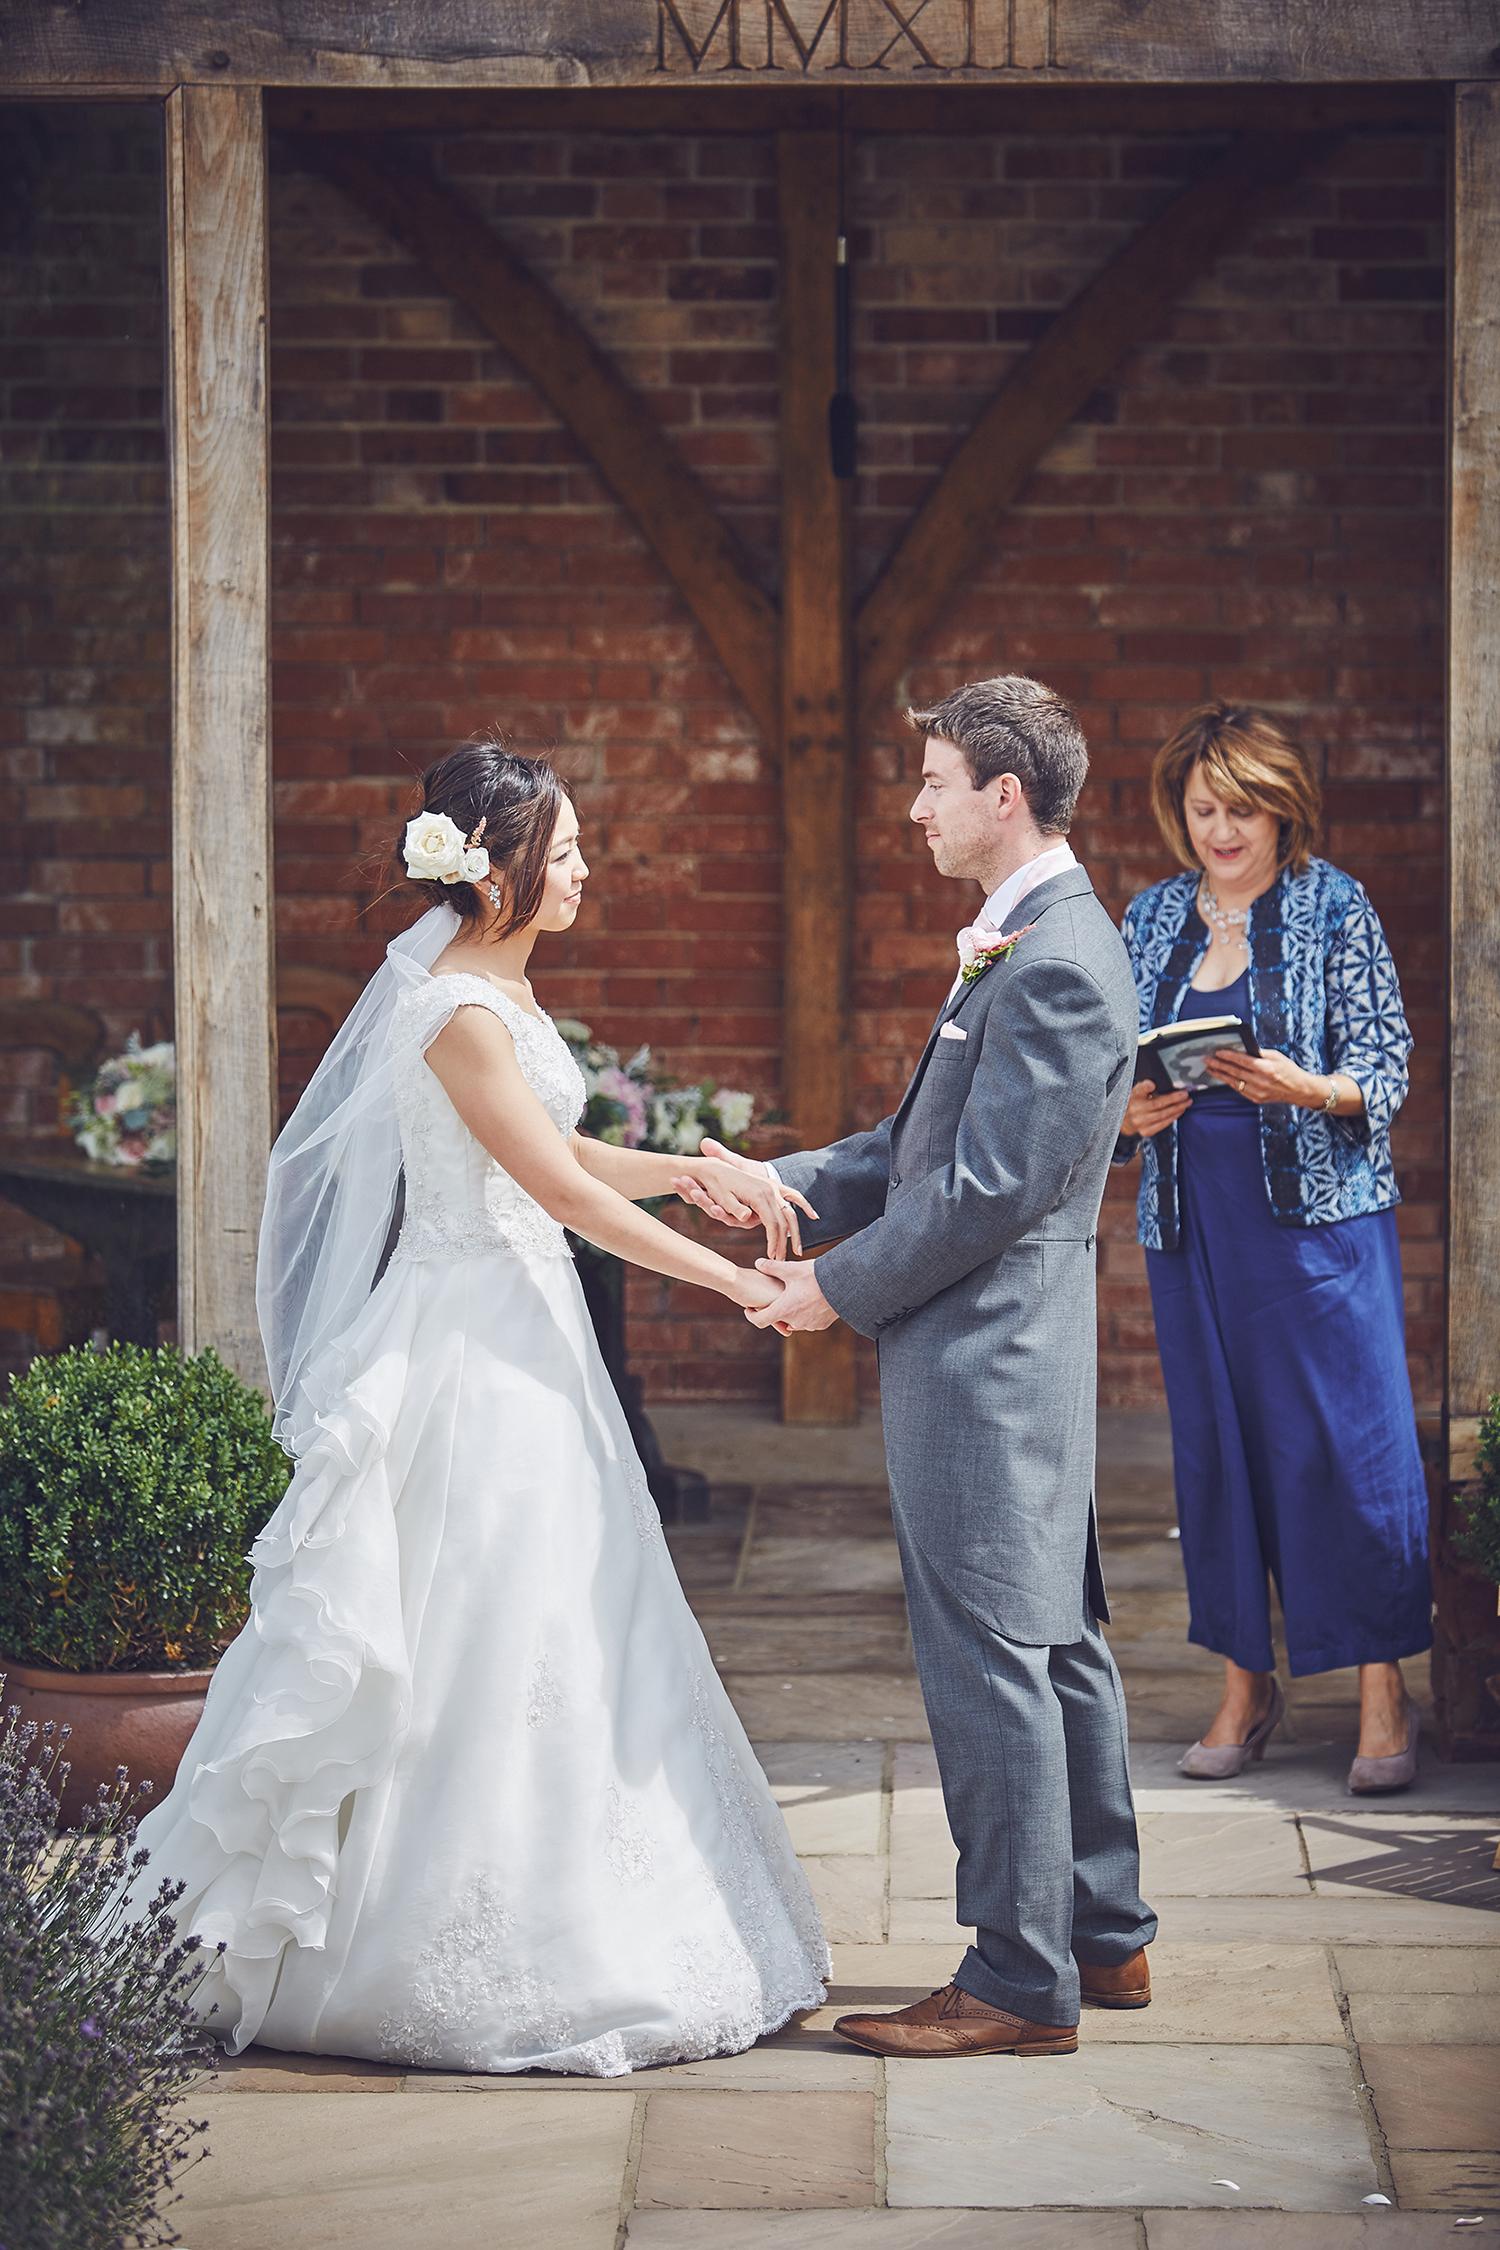 Peter and Misako exchange vows